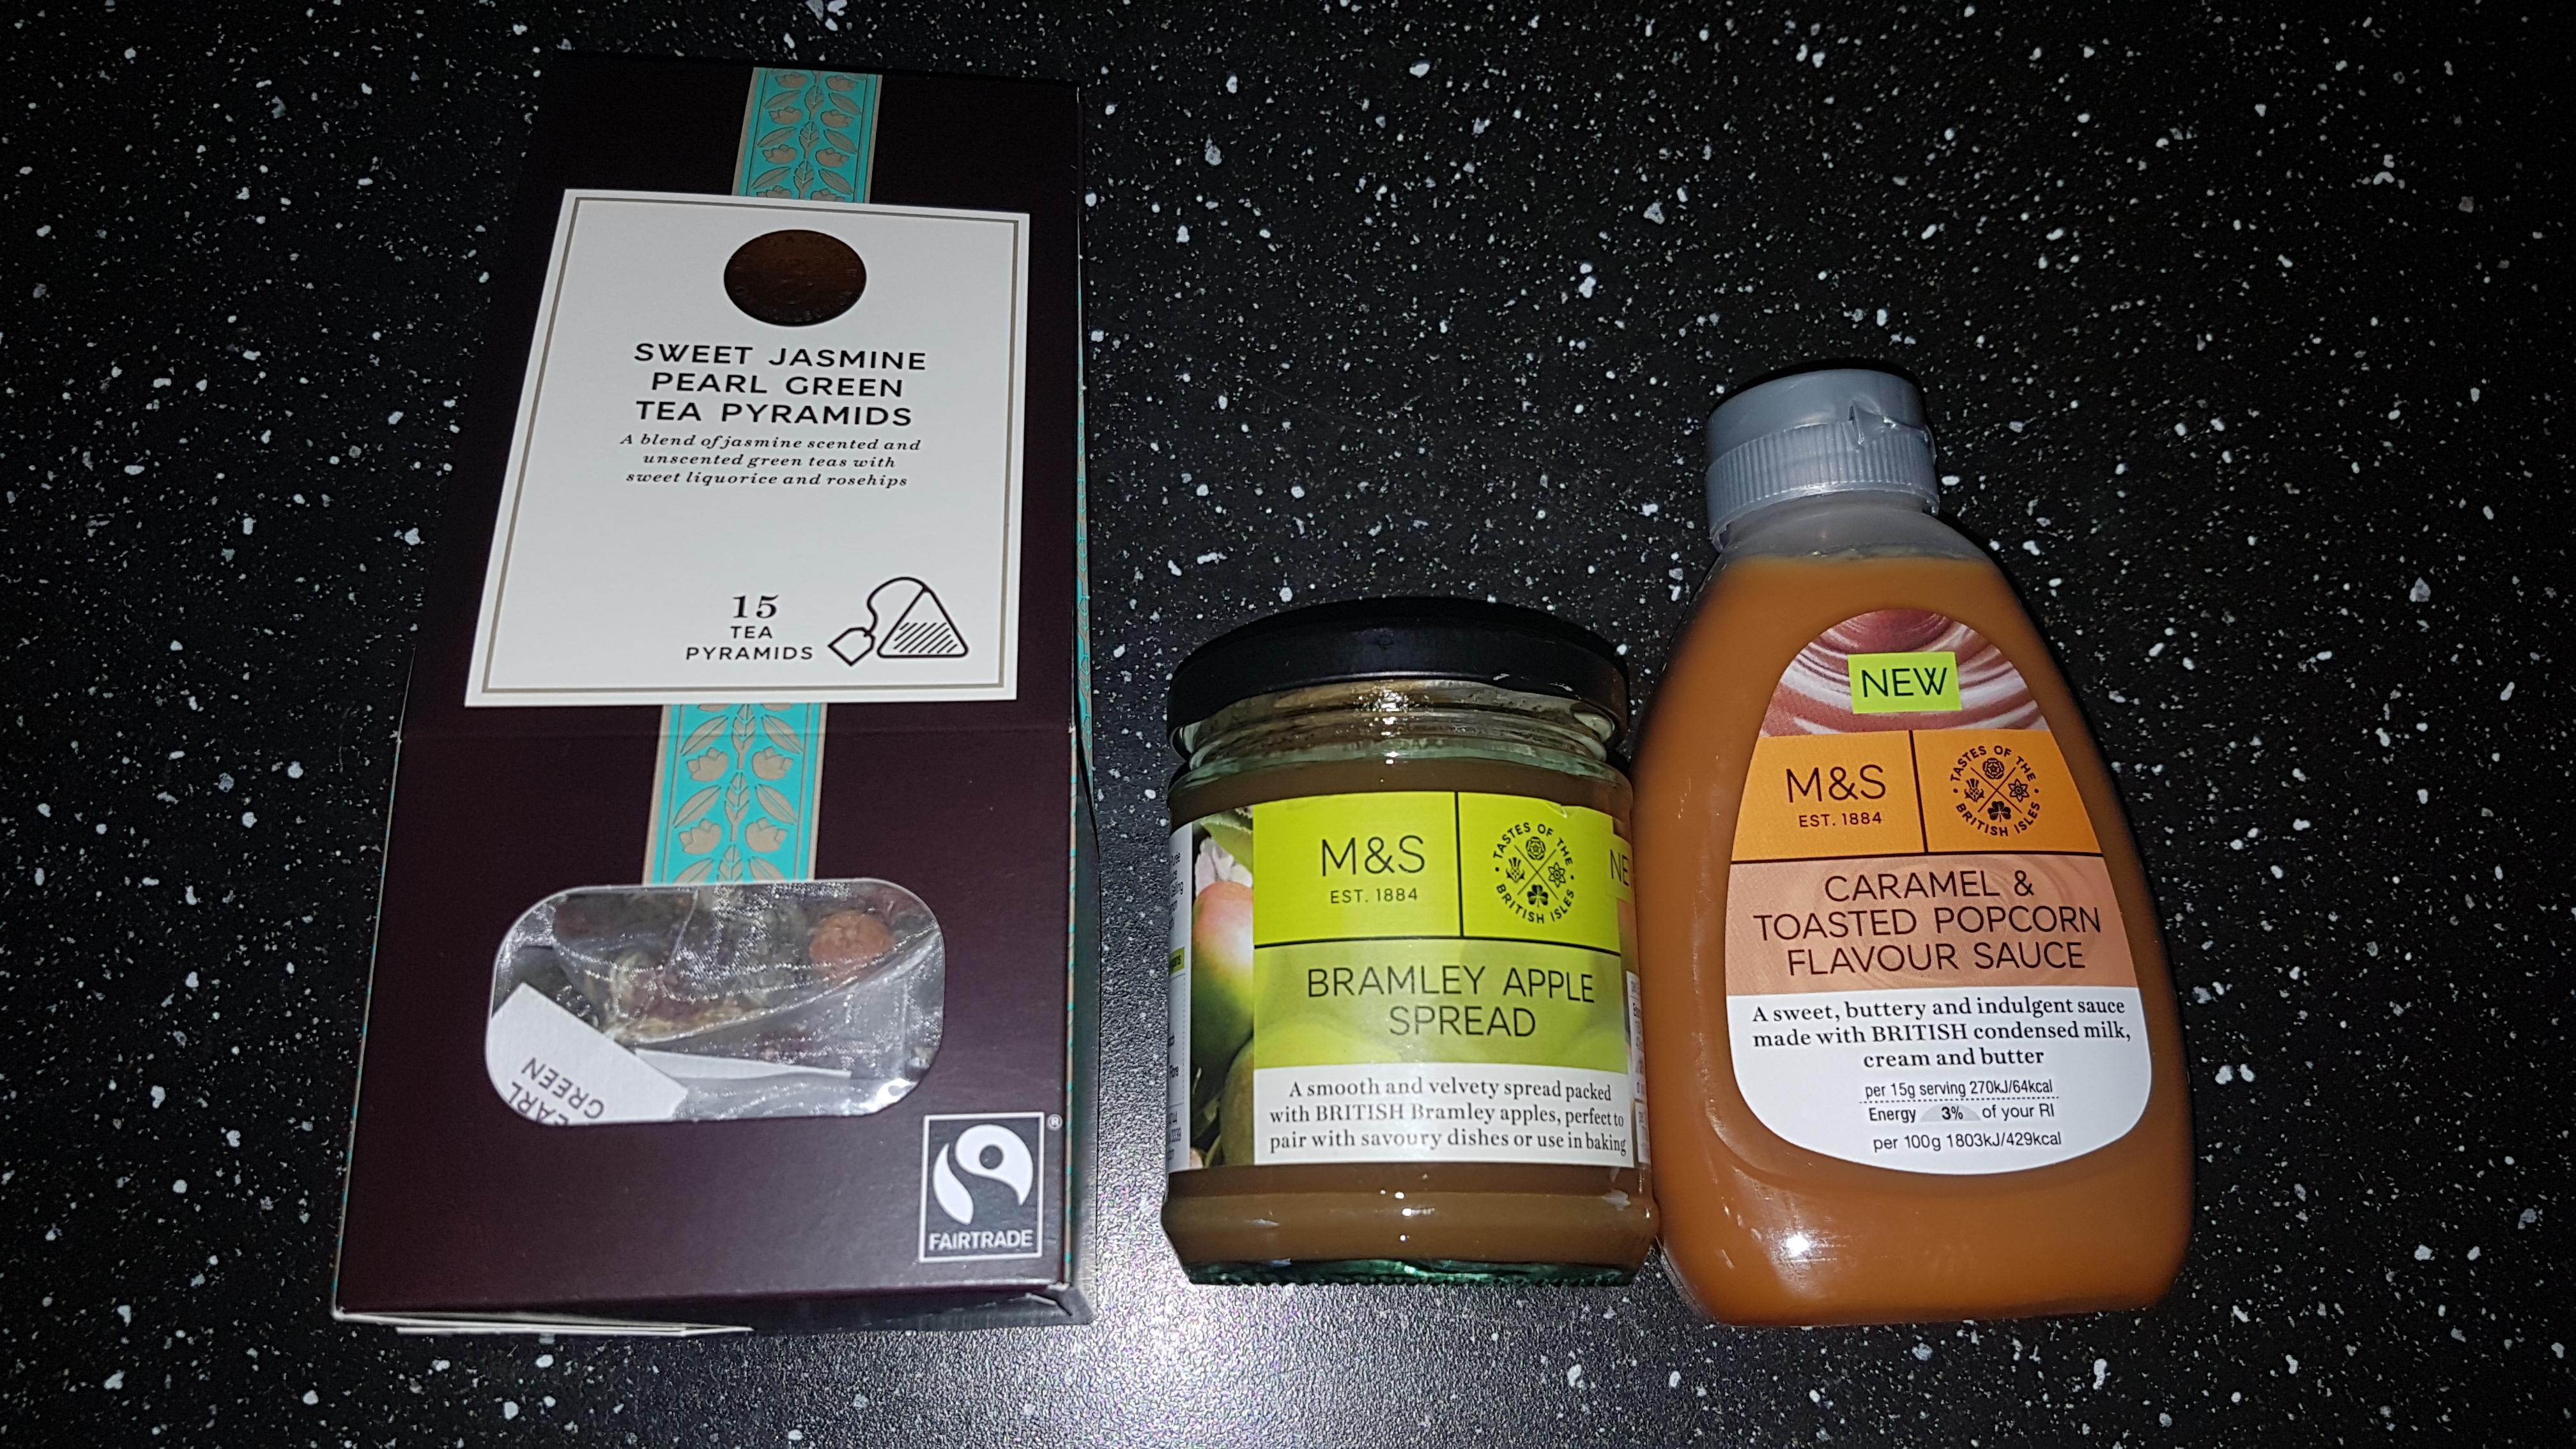 M&S Caramel and Toasted Popcorn Flavour Sauce 25p instore Stockton Heath